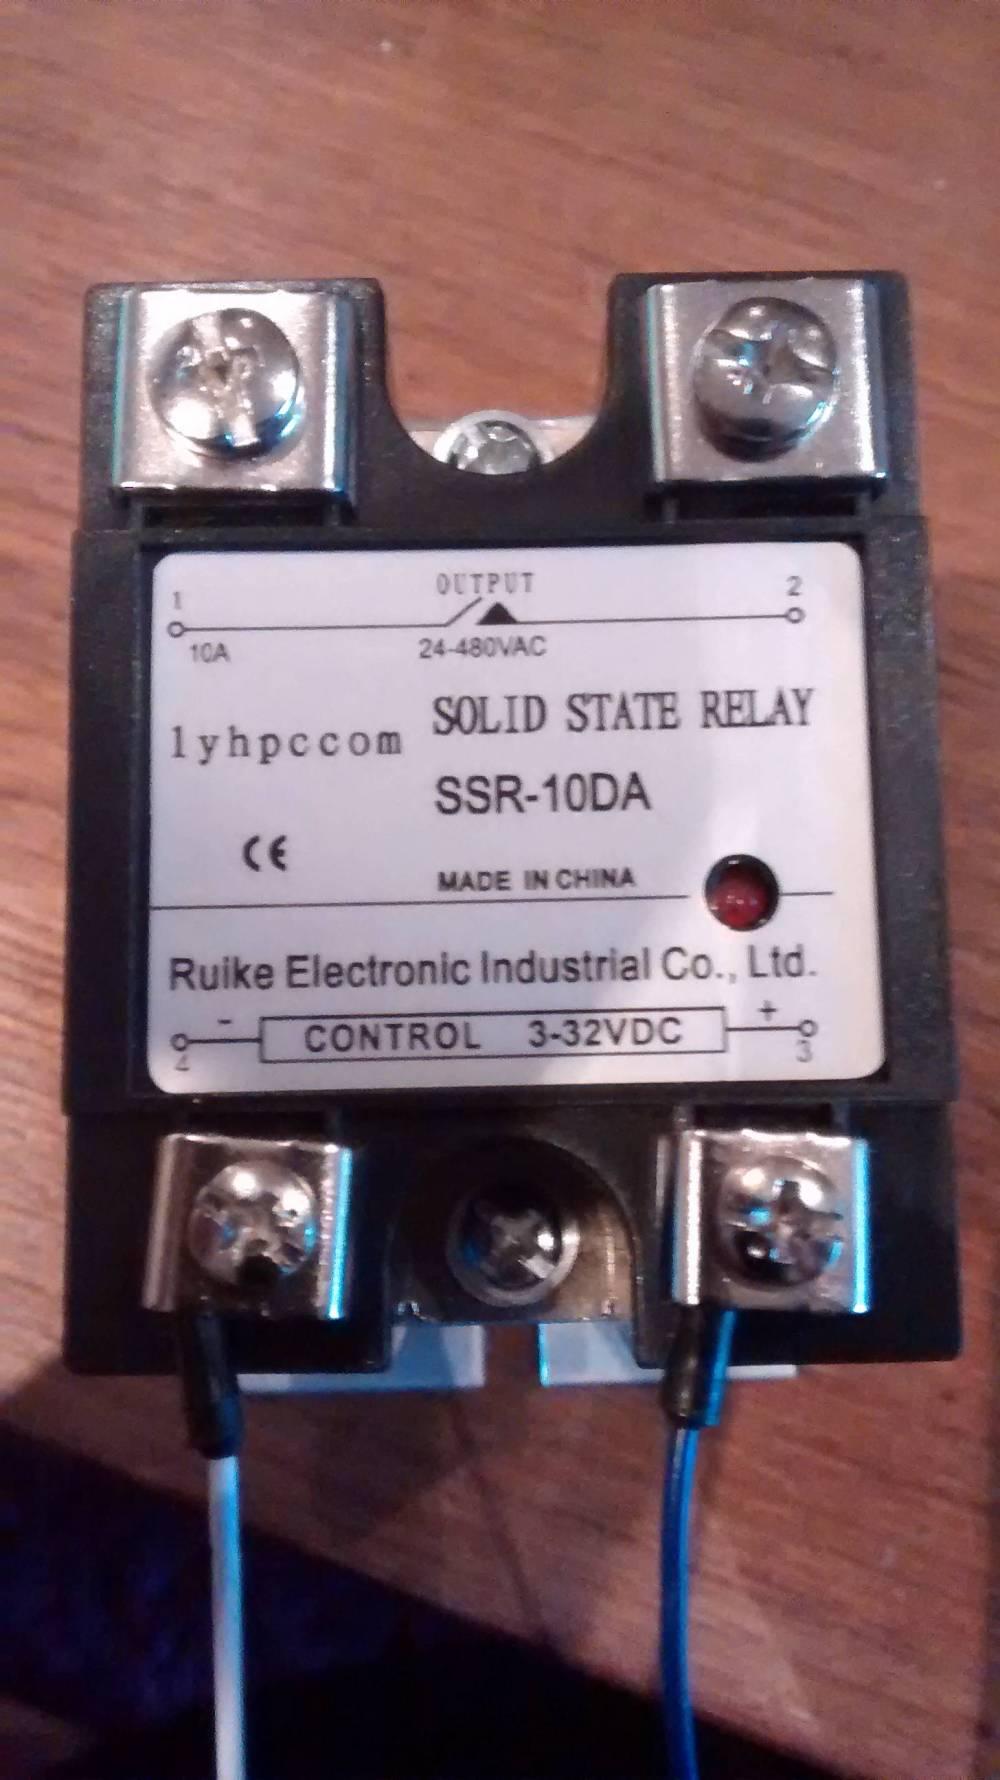 medium resolution of raspberry pi wiring an ssr rasberry pi with an ssr 10da small solid state relay wiring diagram wiring ssr da 10